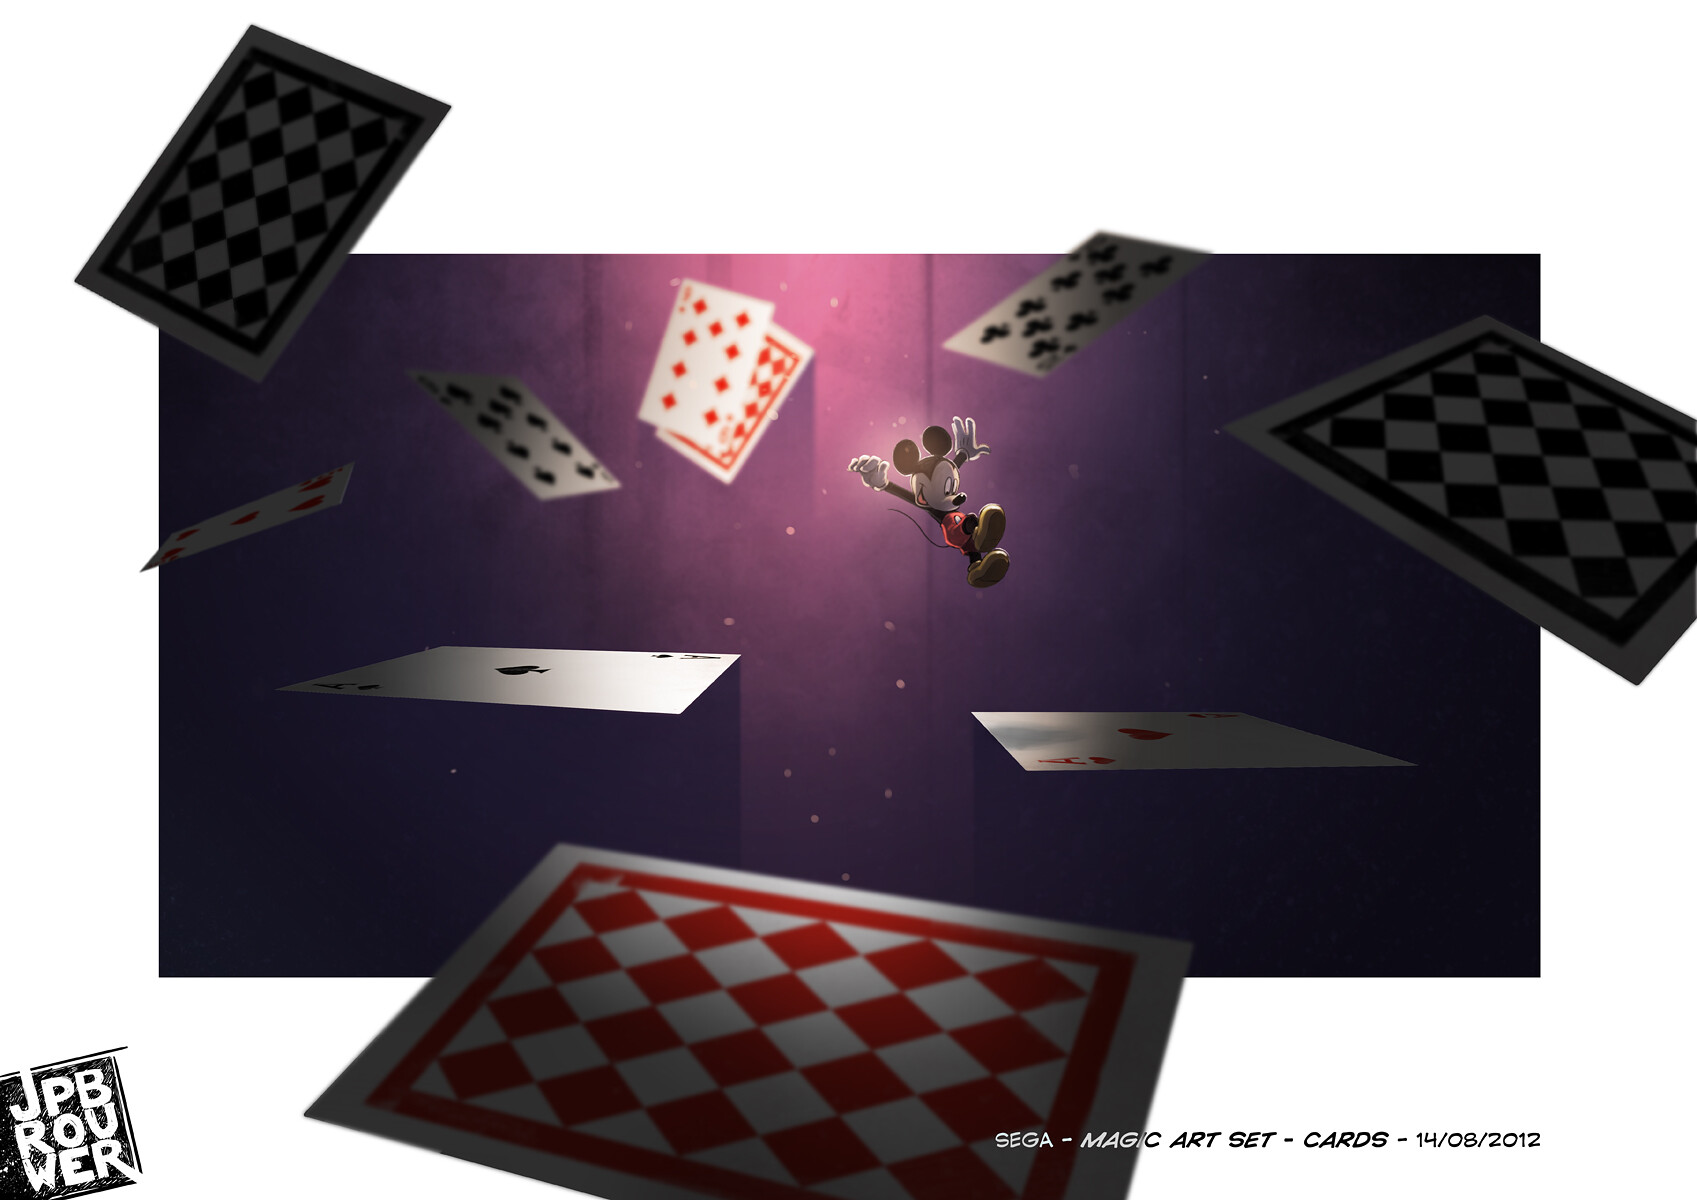 James brouwer sega magicartset cards140812